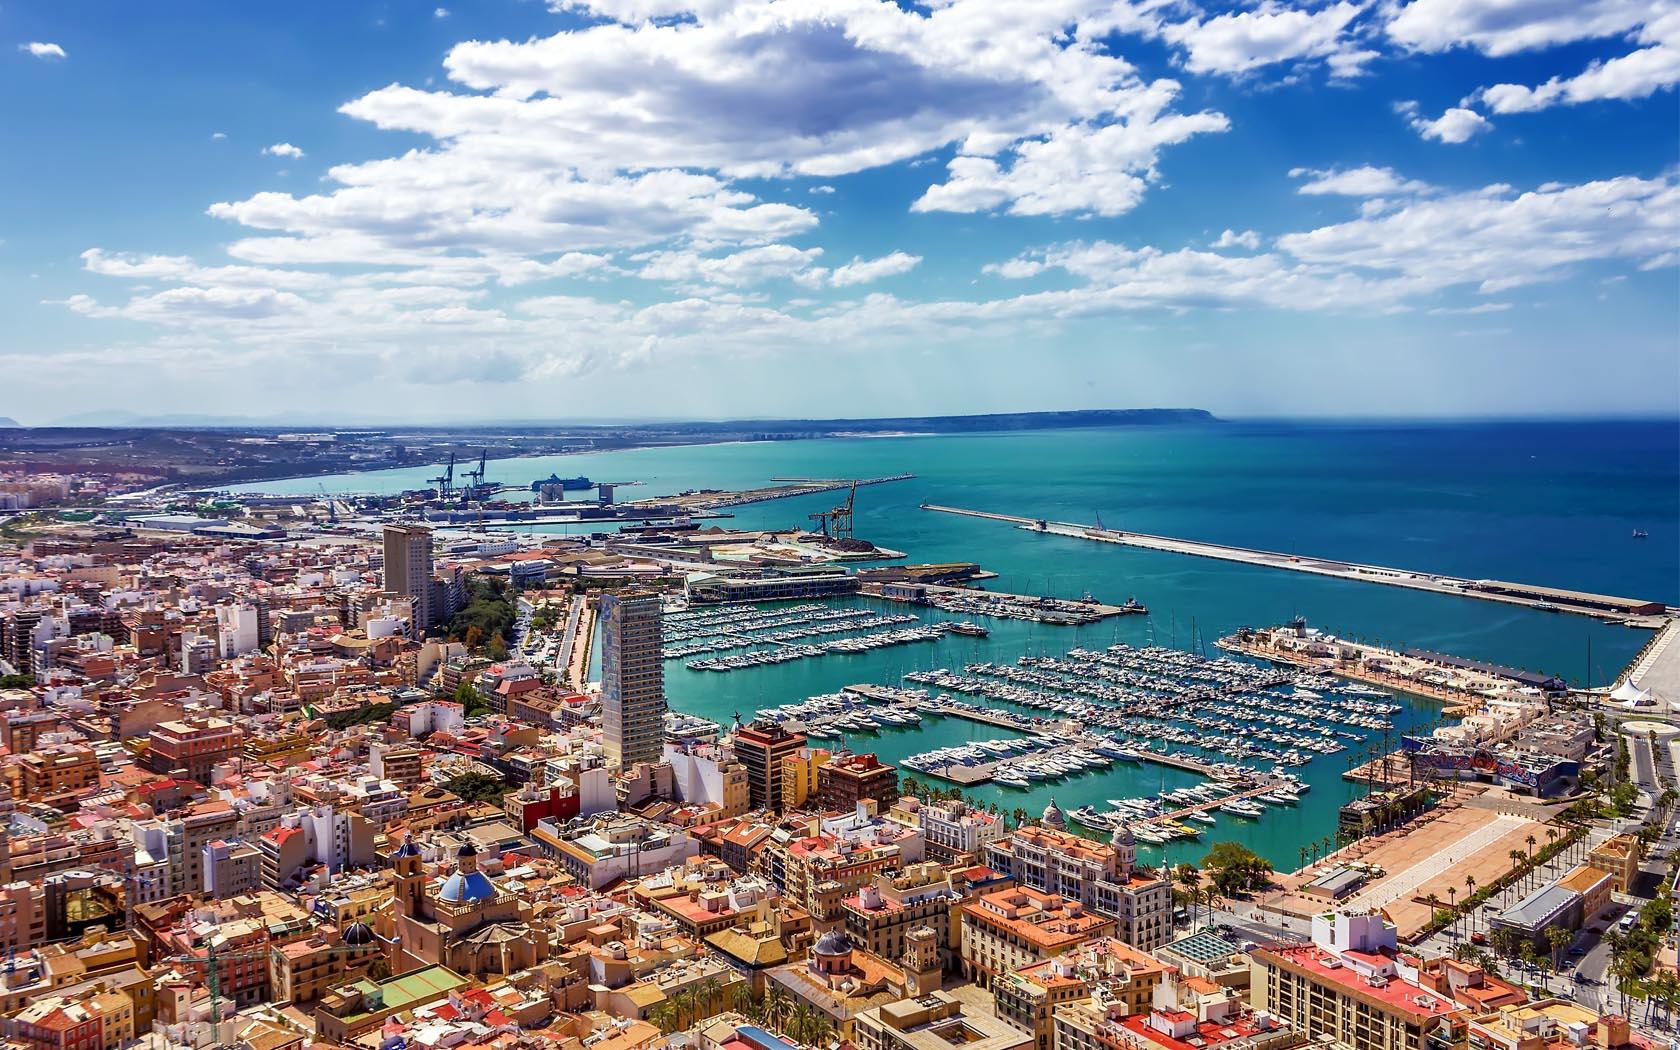 Alicante Kasa25